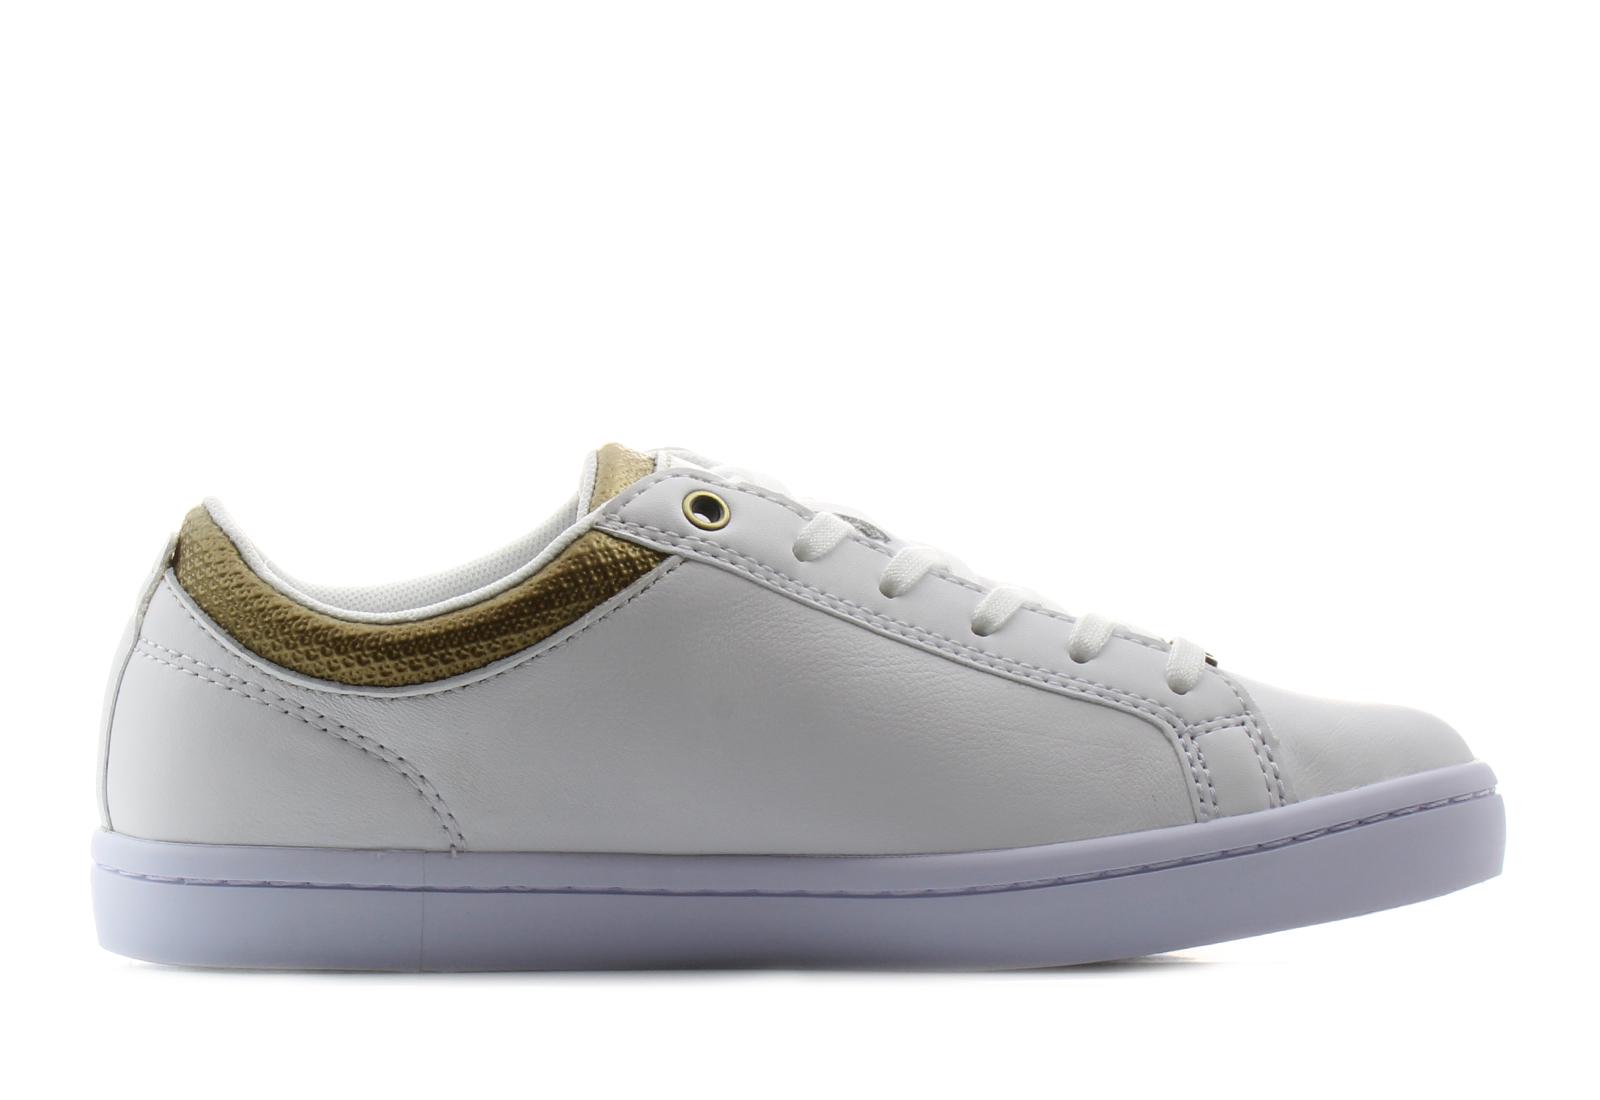 Lacoste Cipő - Straightset 118 1 - 181caw0064-216 - Office Shoes ... e8610e8f33